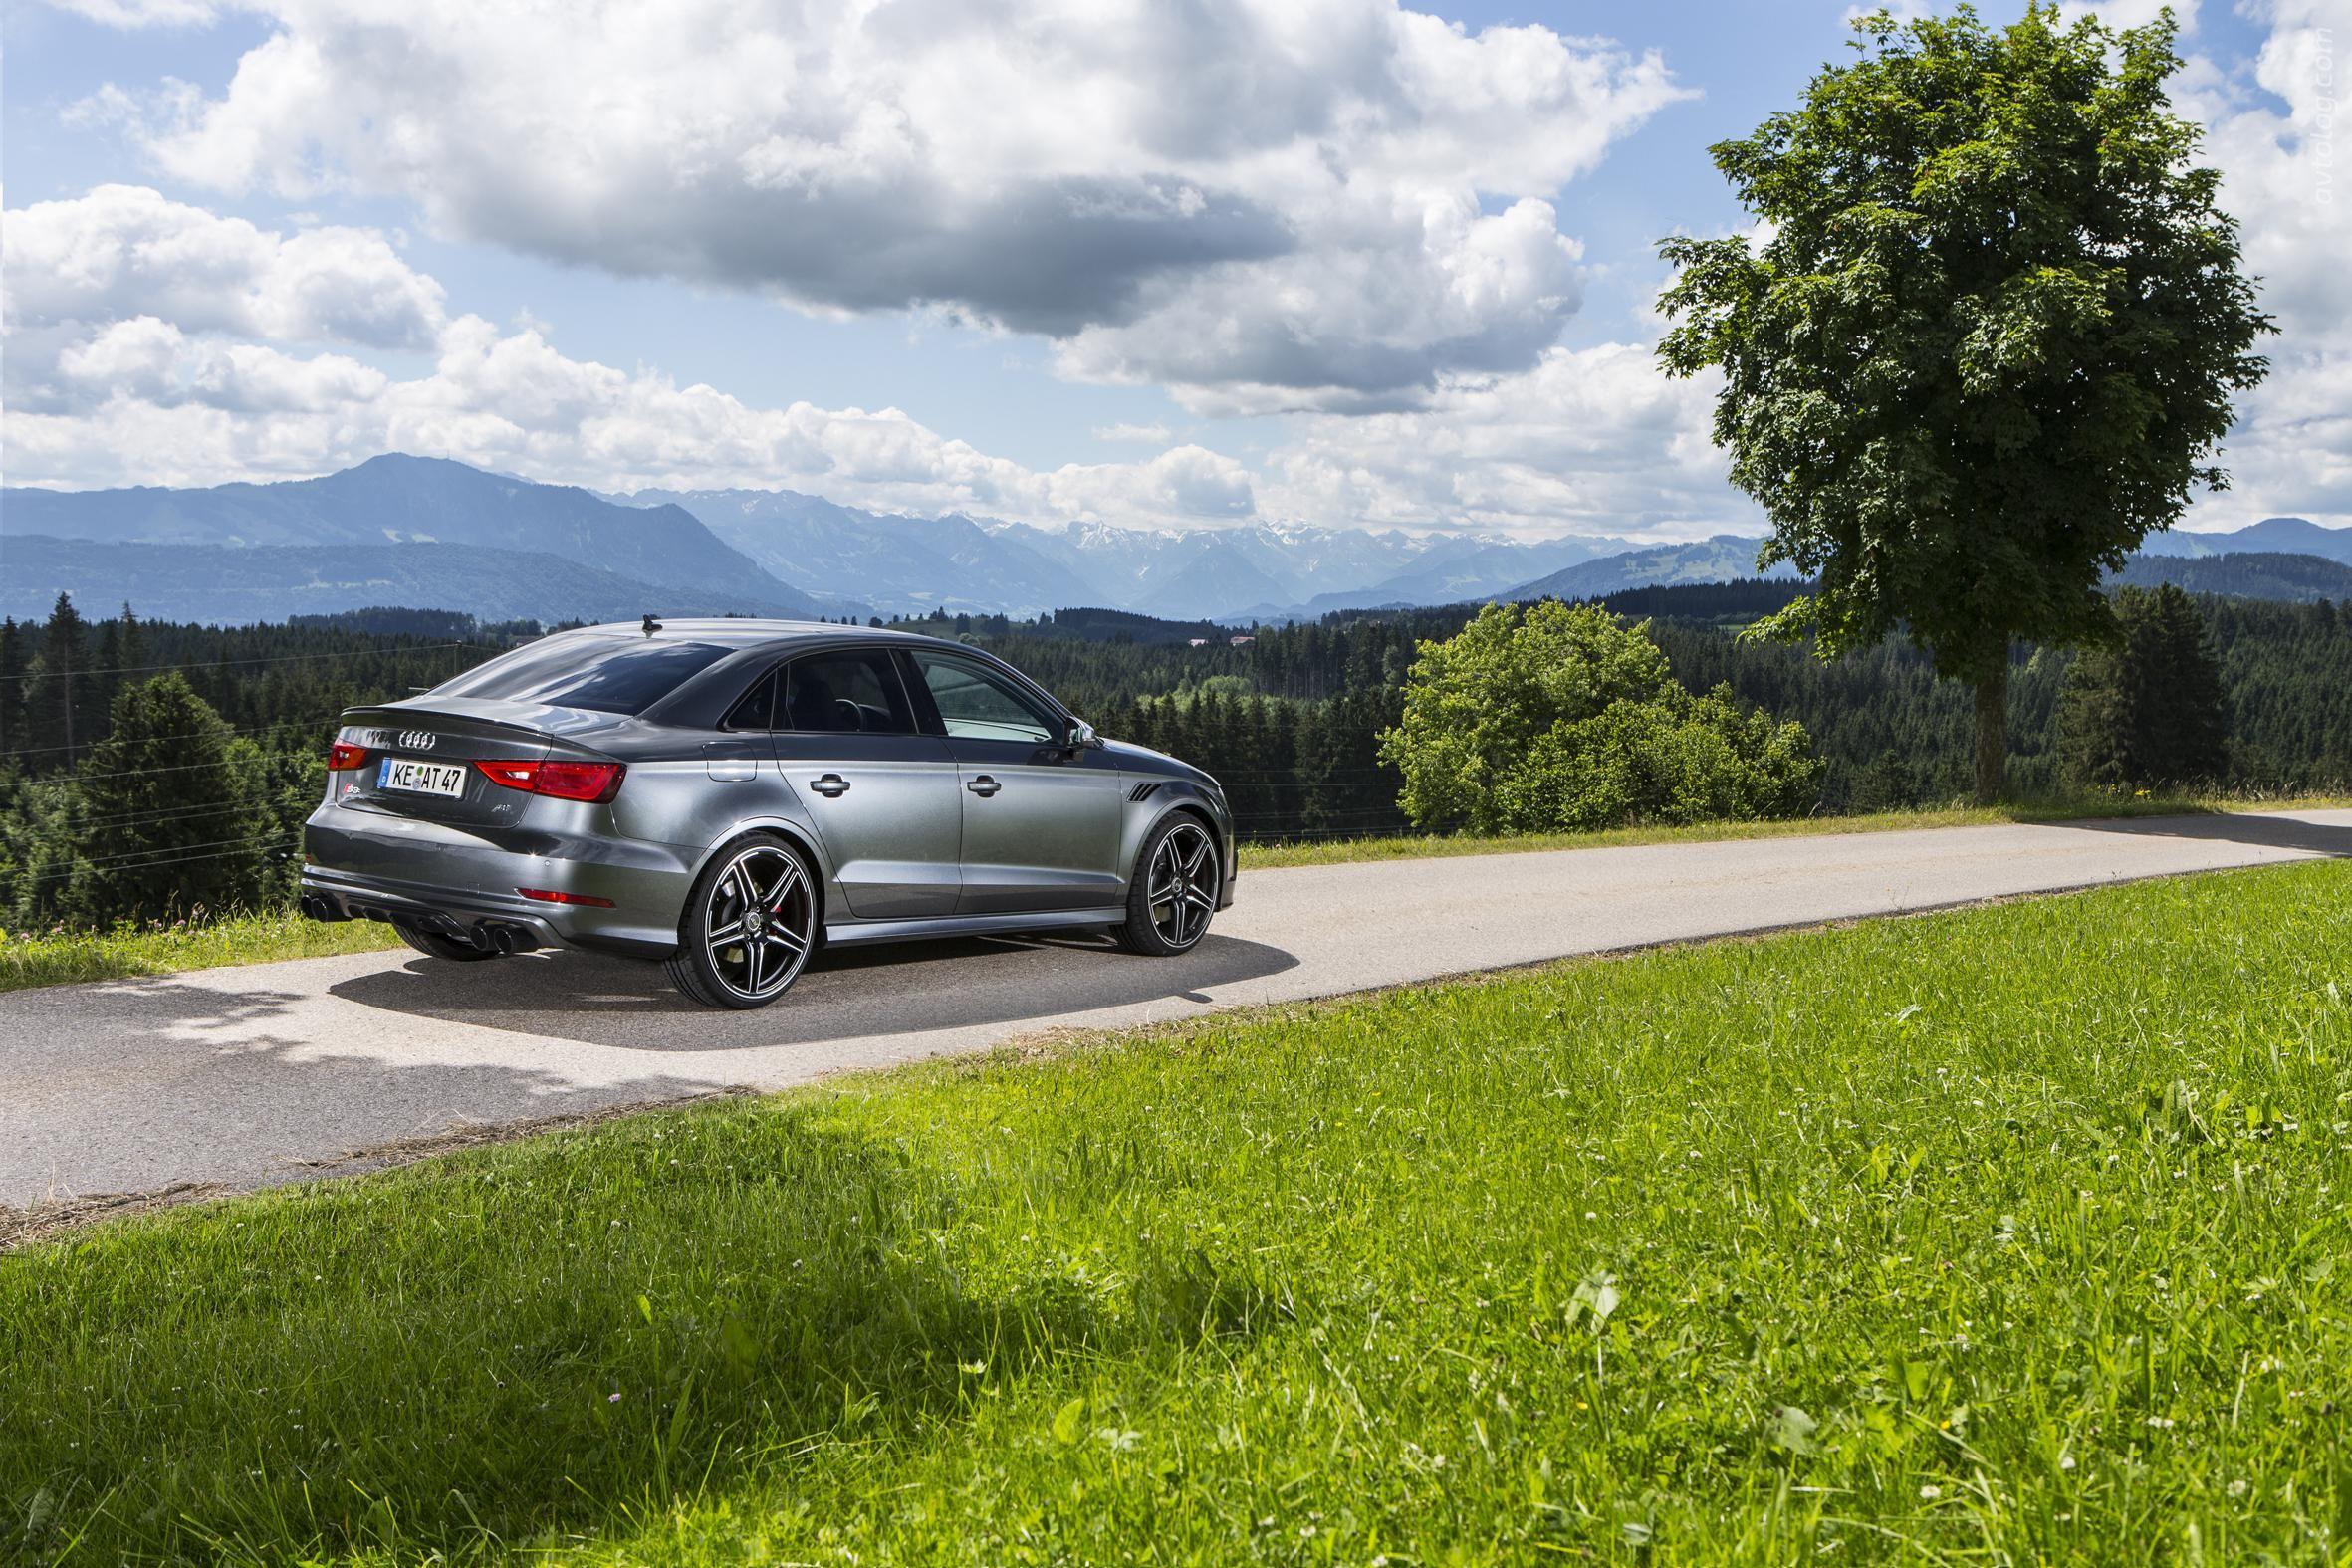 2015 ABT Sportsline Audi S3 Sedan  #Segment_C #Audi_S3 #ABT #tuning #2015MY #German_brands #Audi_S3_Sedan #Audi #Serial #S_Tronic